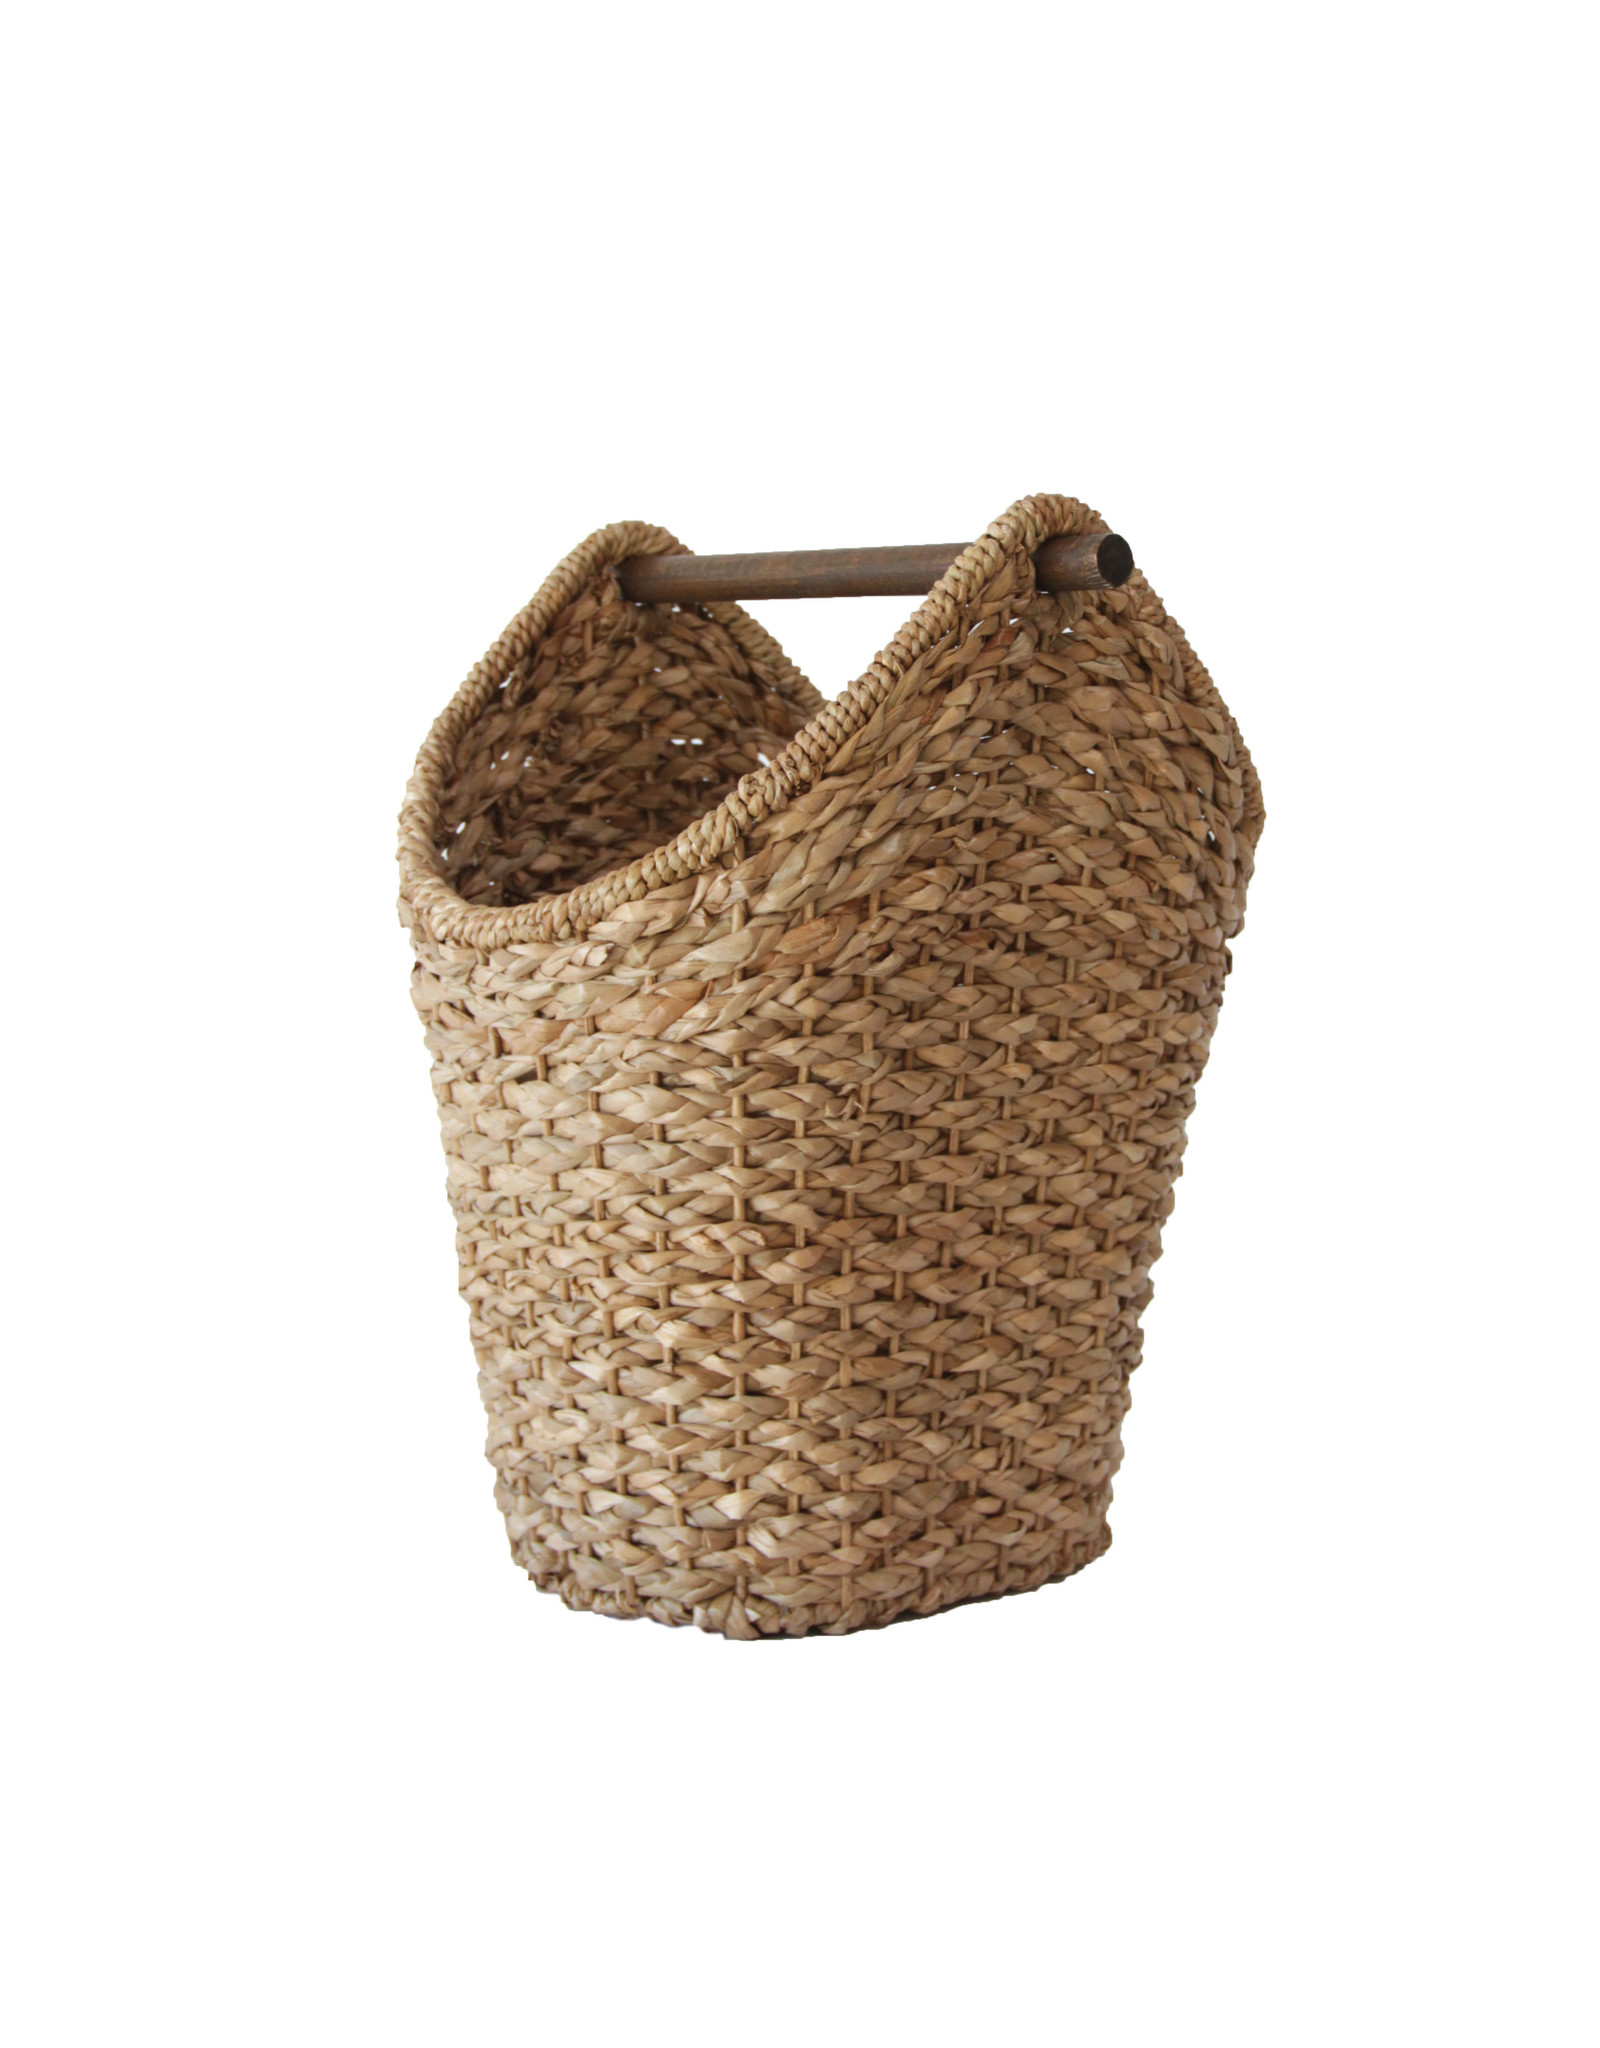 Website Bankuan Braided Tissue Basket